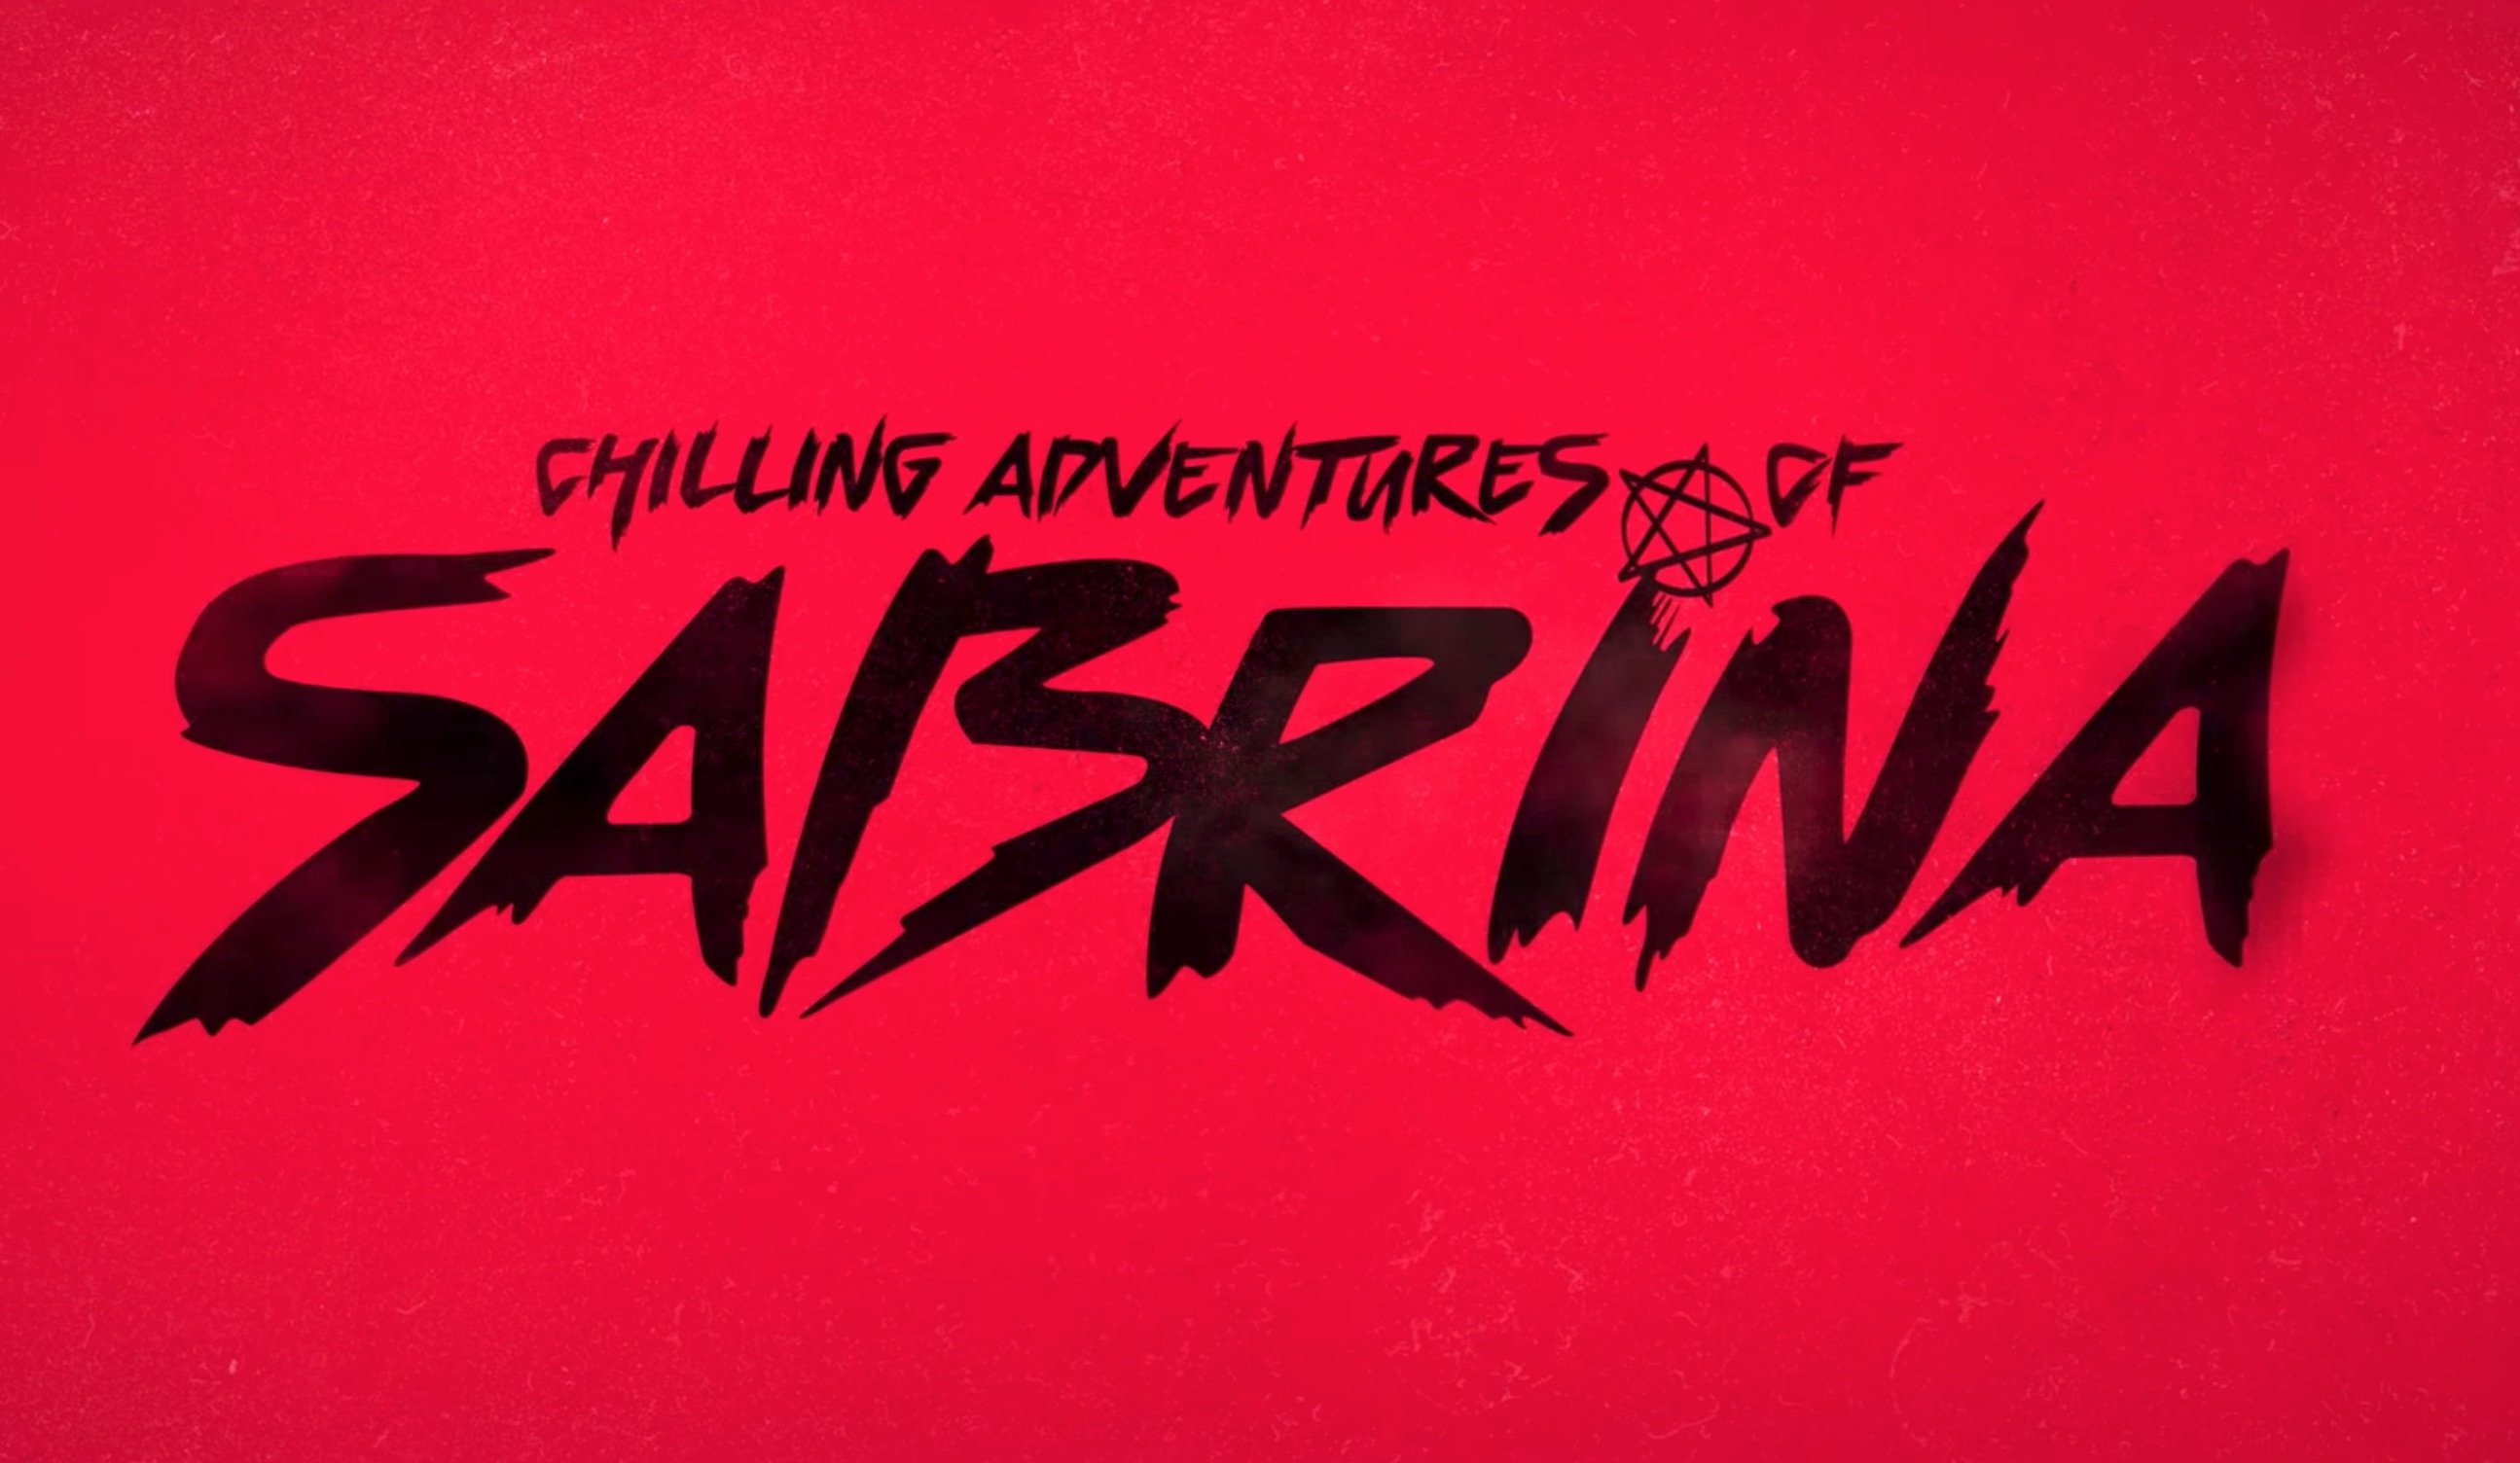 Chilling adventures of sabrina.jpg